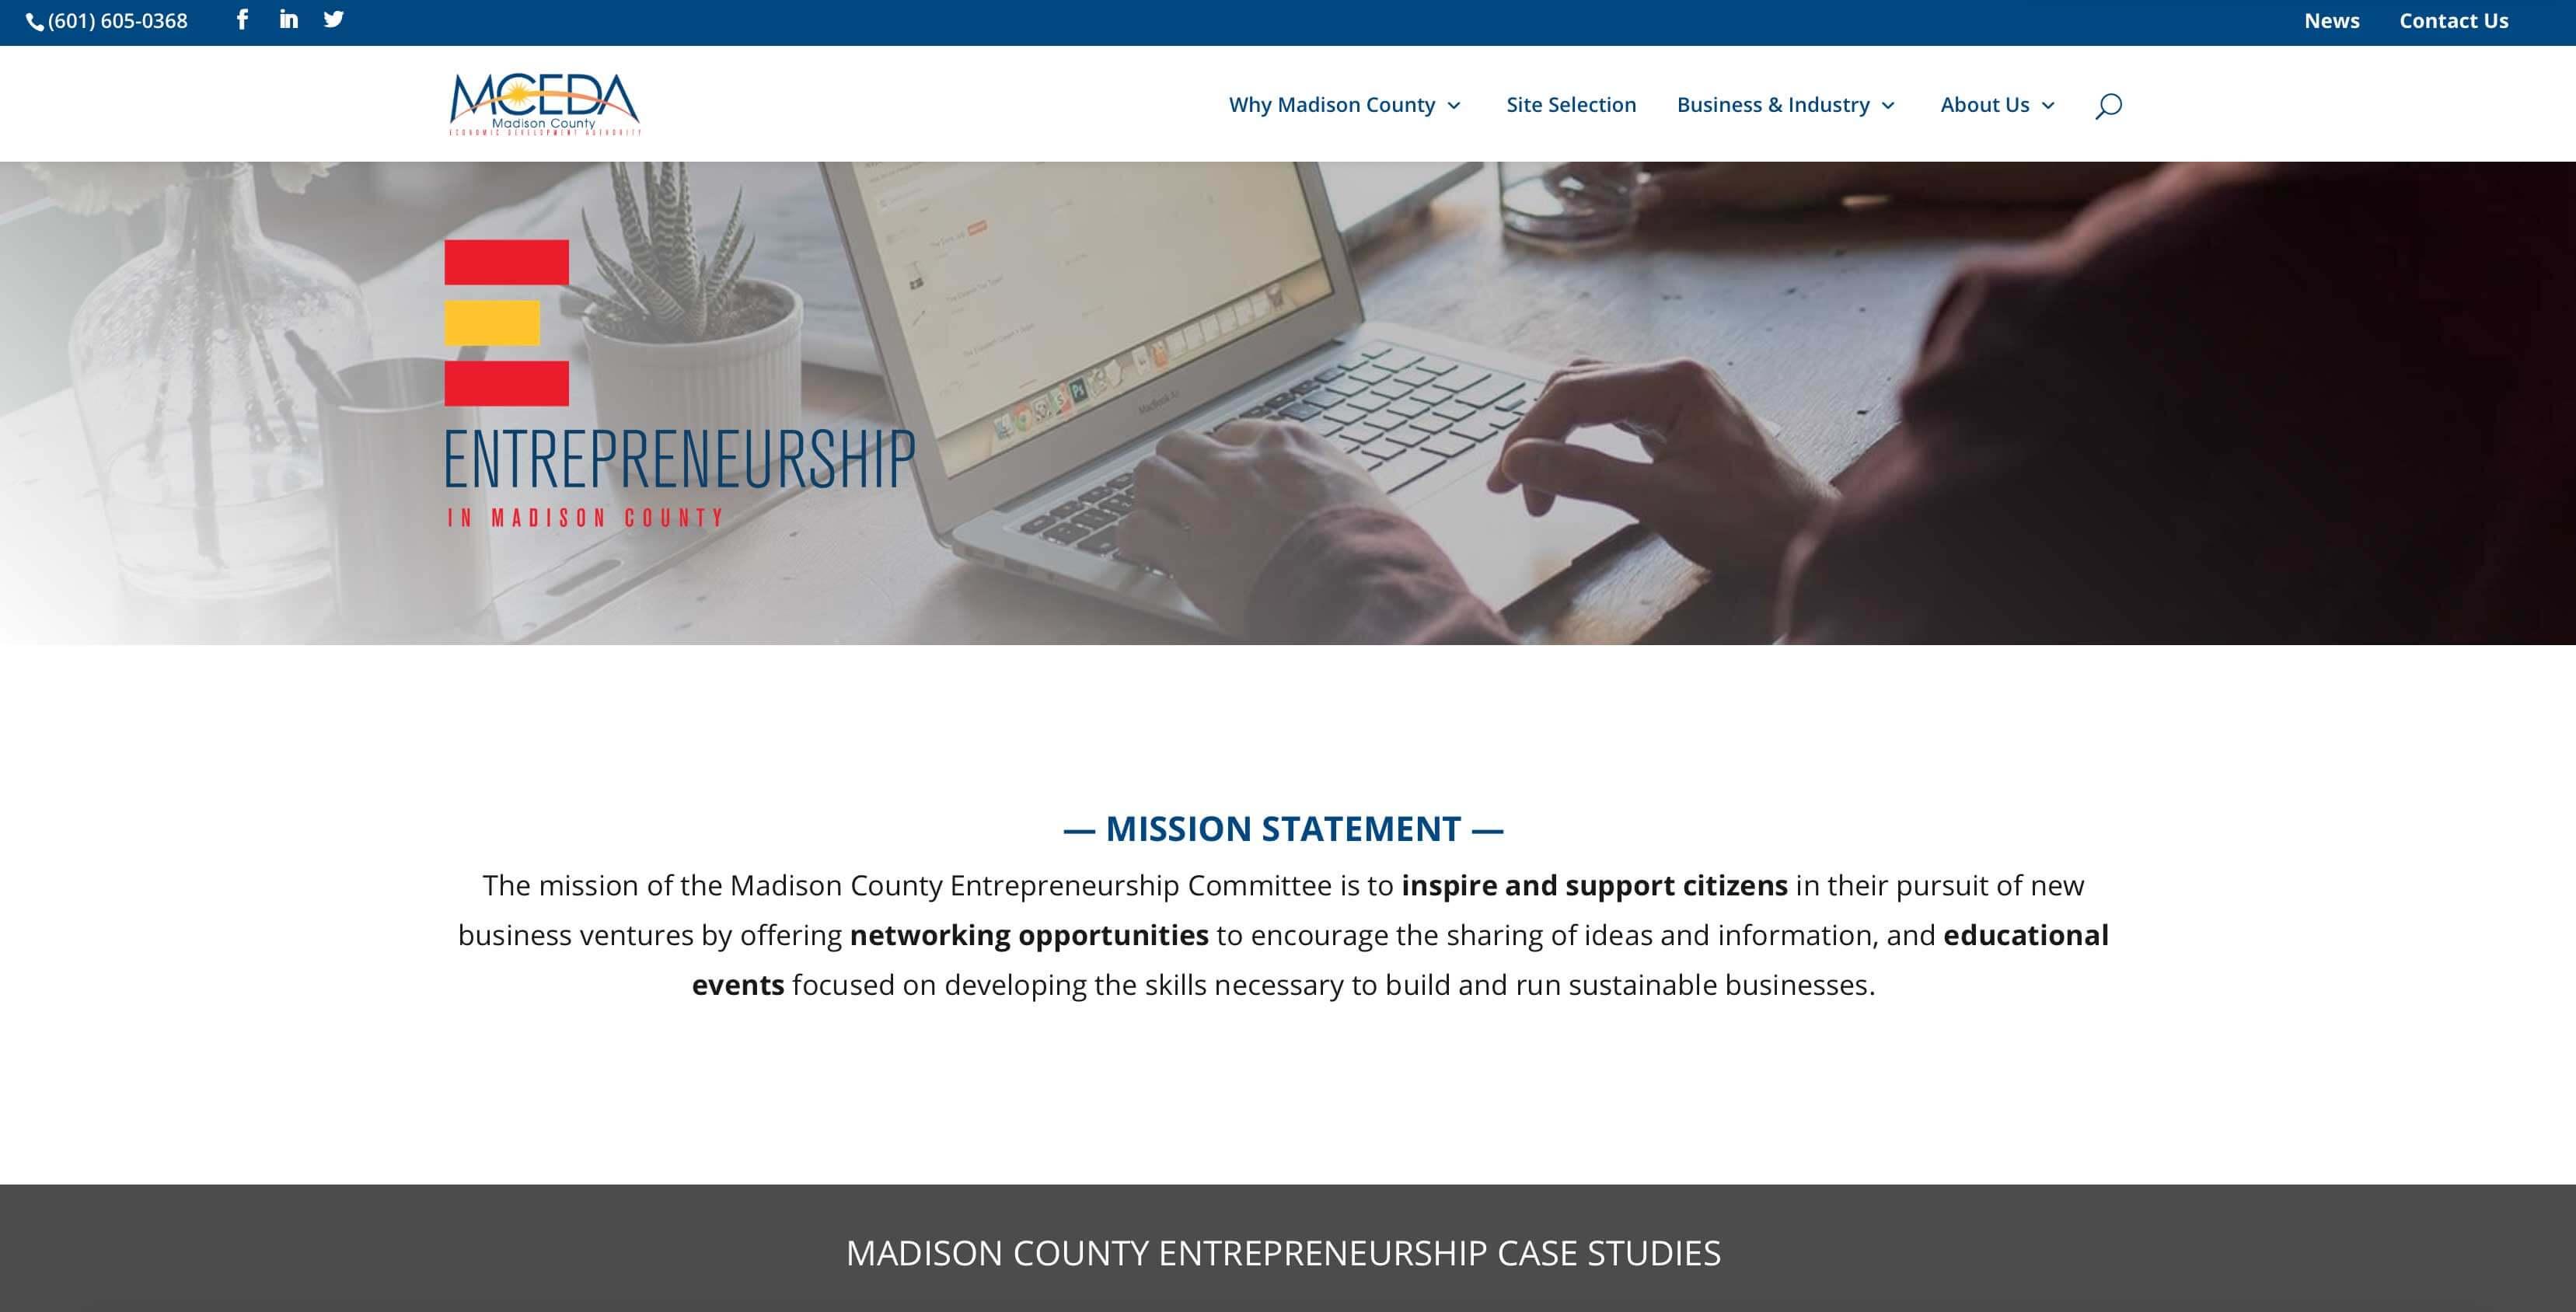 MCEDA Entrepreneurship webpage